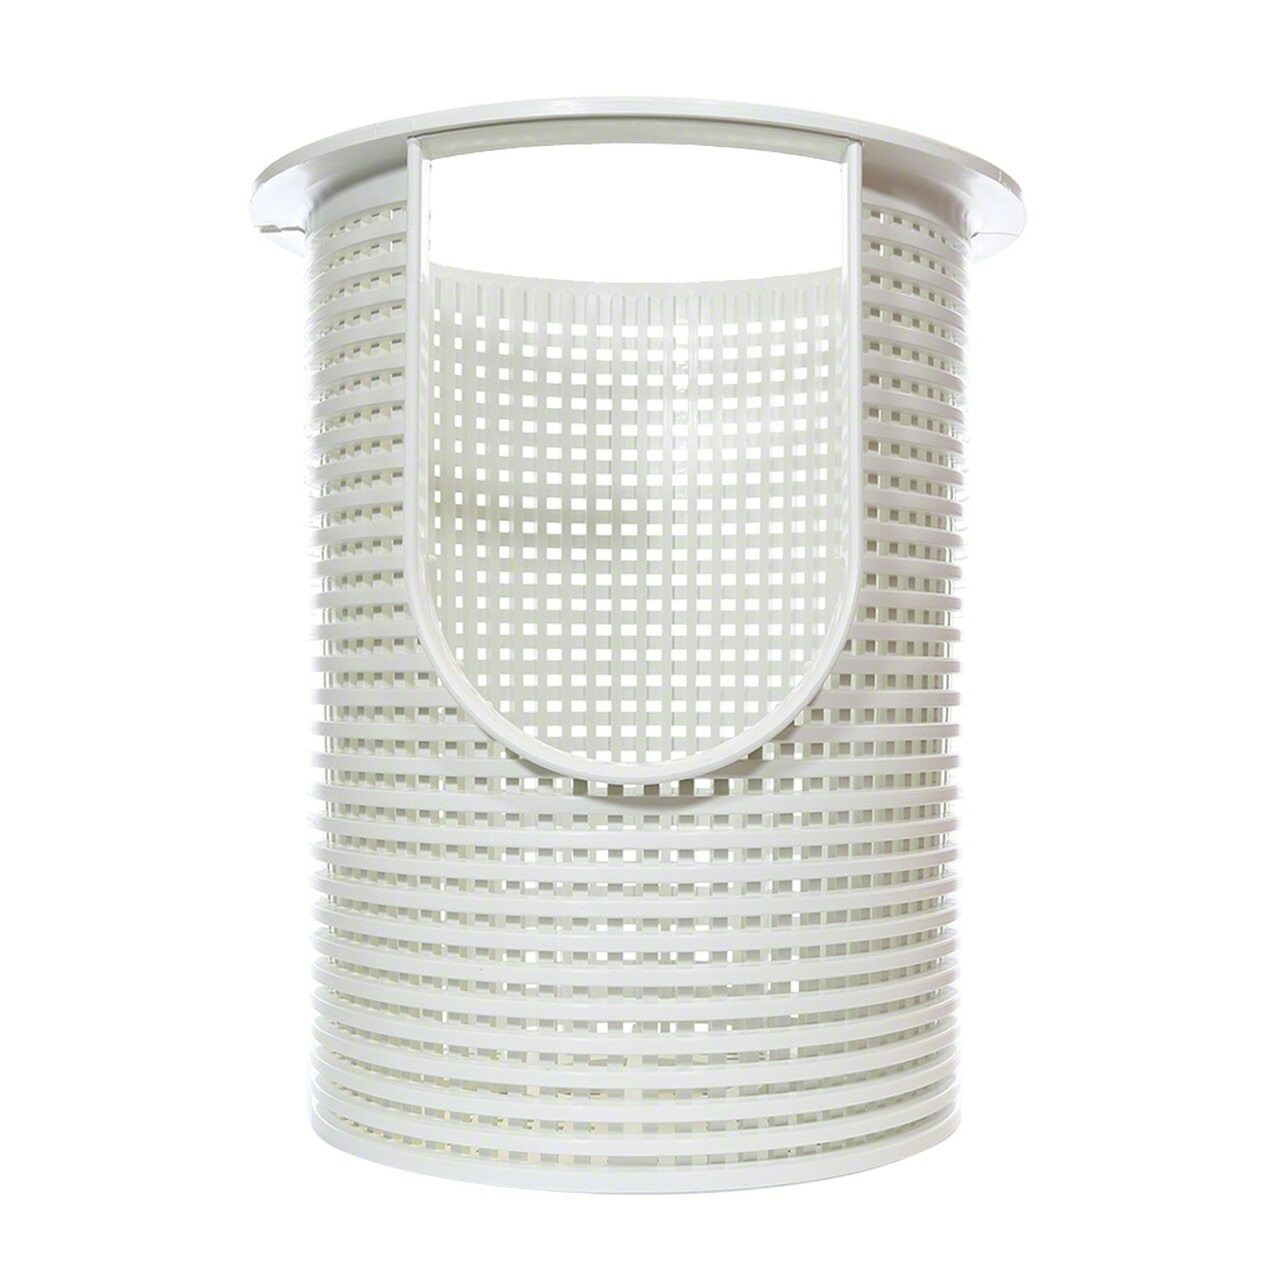 Basket Strainer Replacement EQ-Series Commercial Plastic Pump